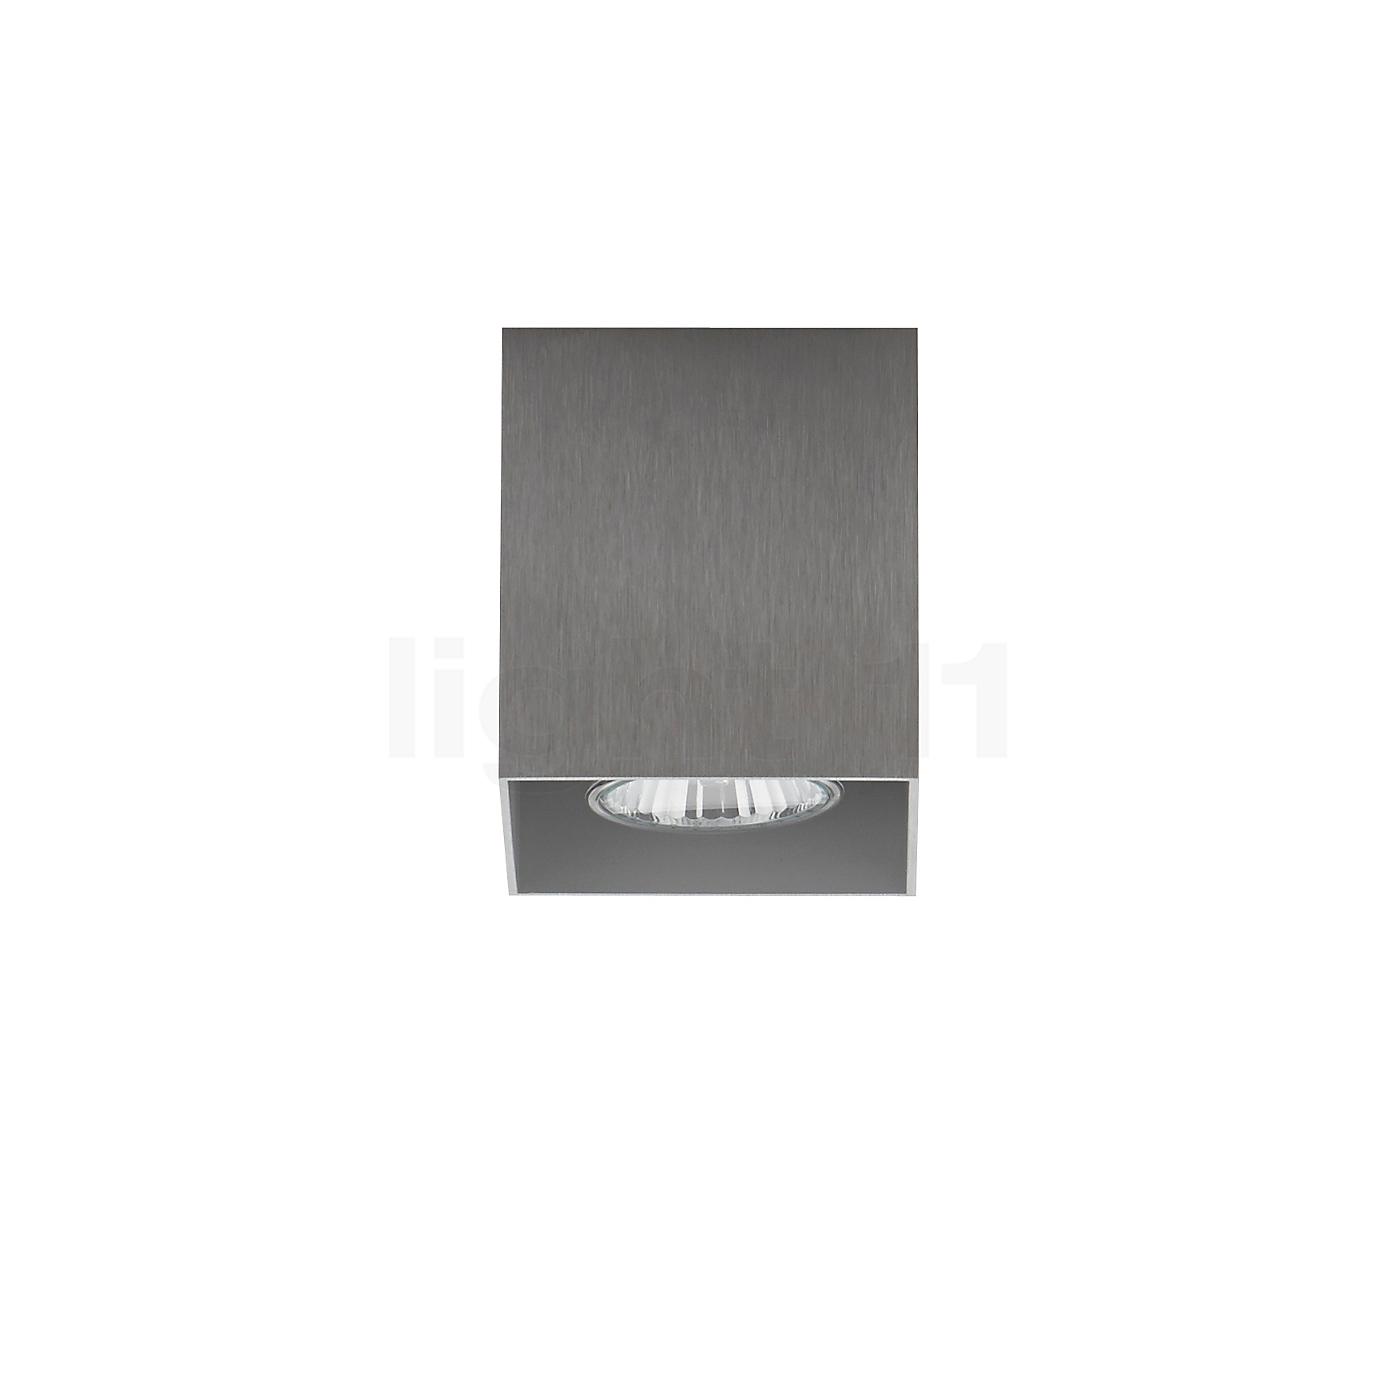 Delta Light Boxy Aufbaustrahler Kaufen Bei Light11 De